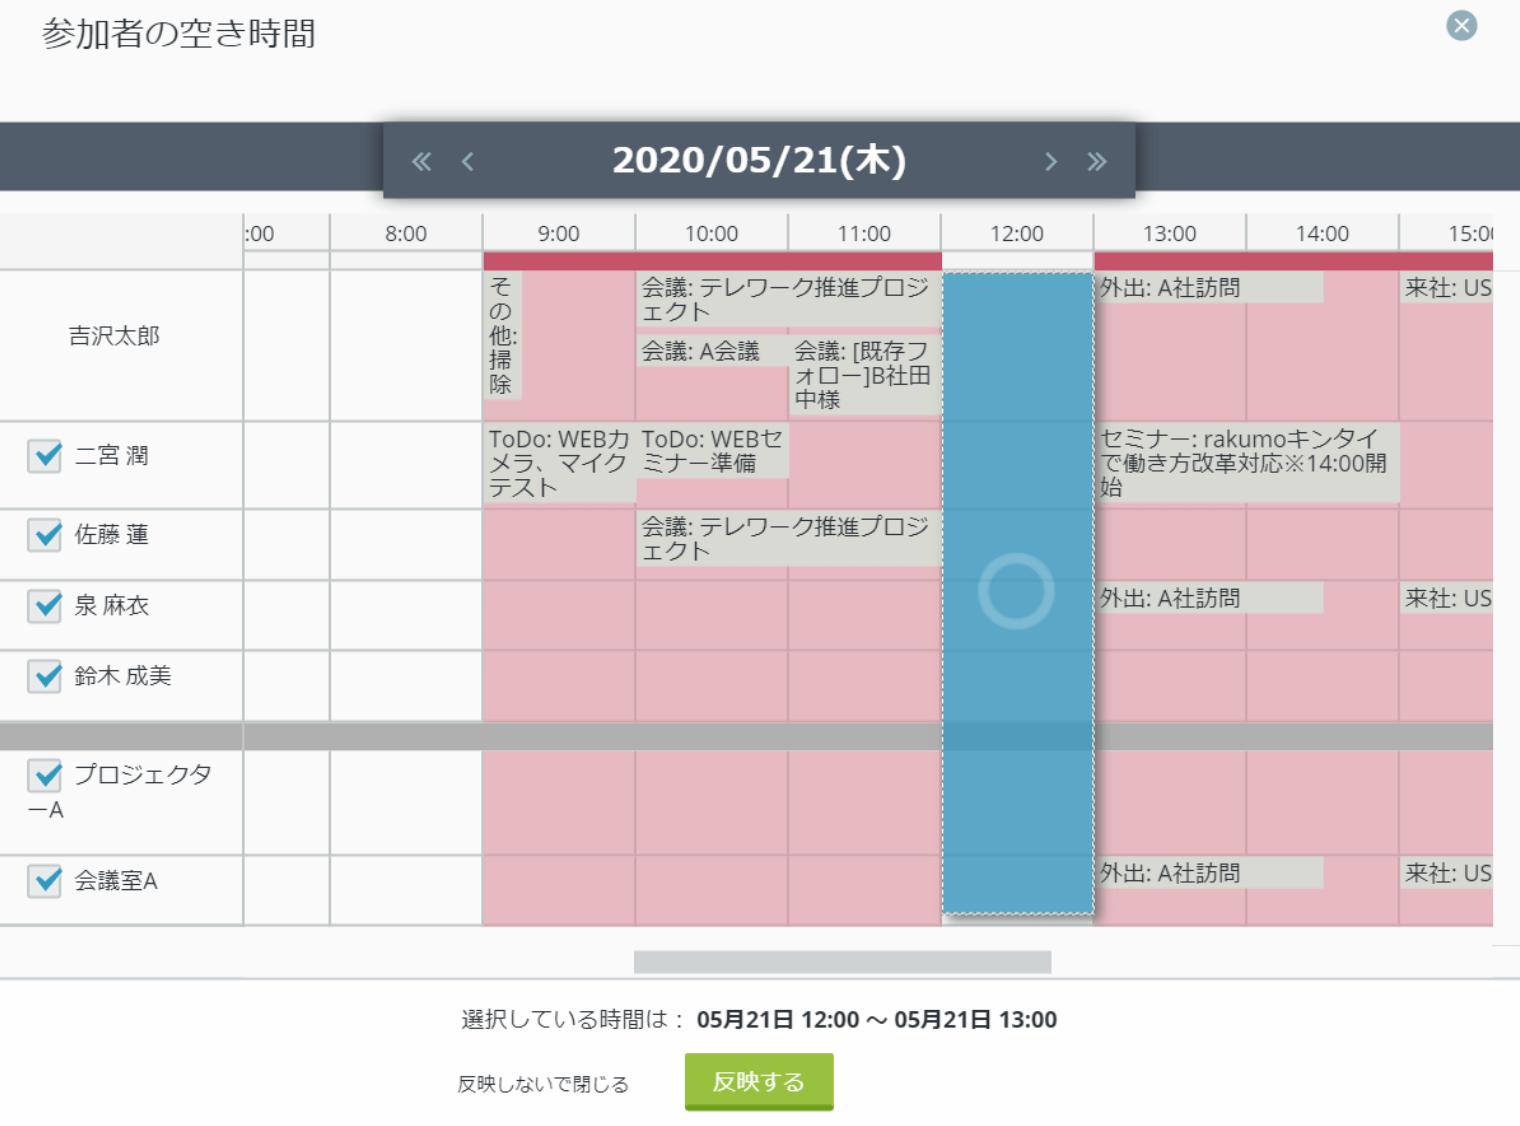 rakumo カレンダー 空き時間を探す画面